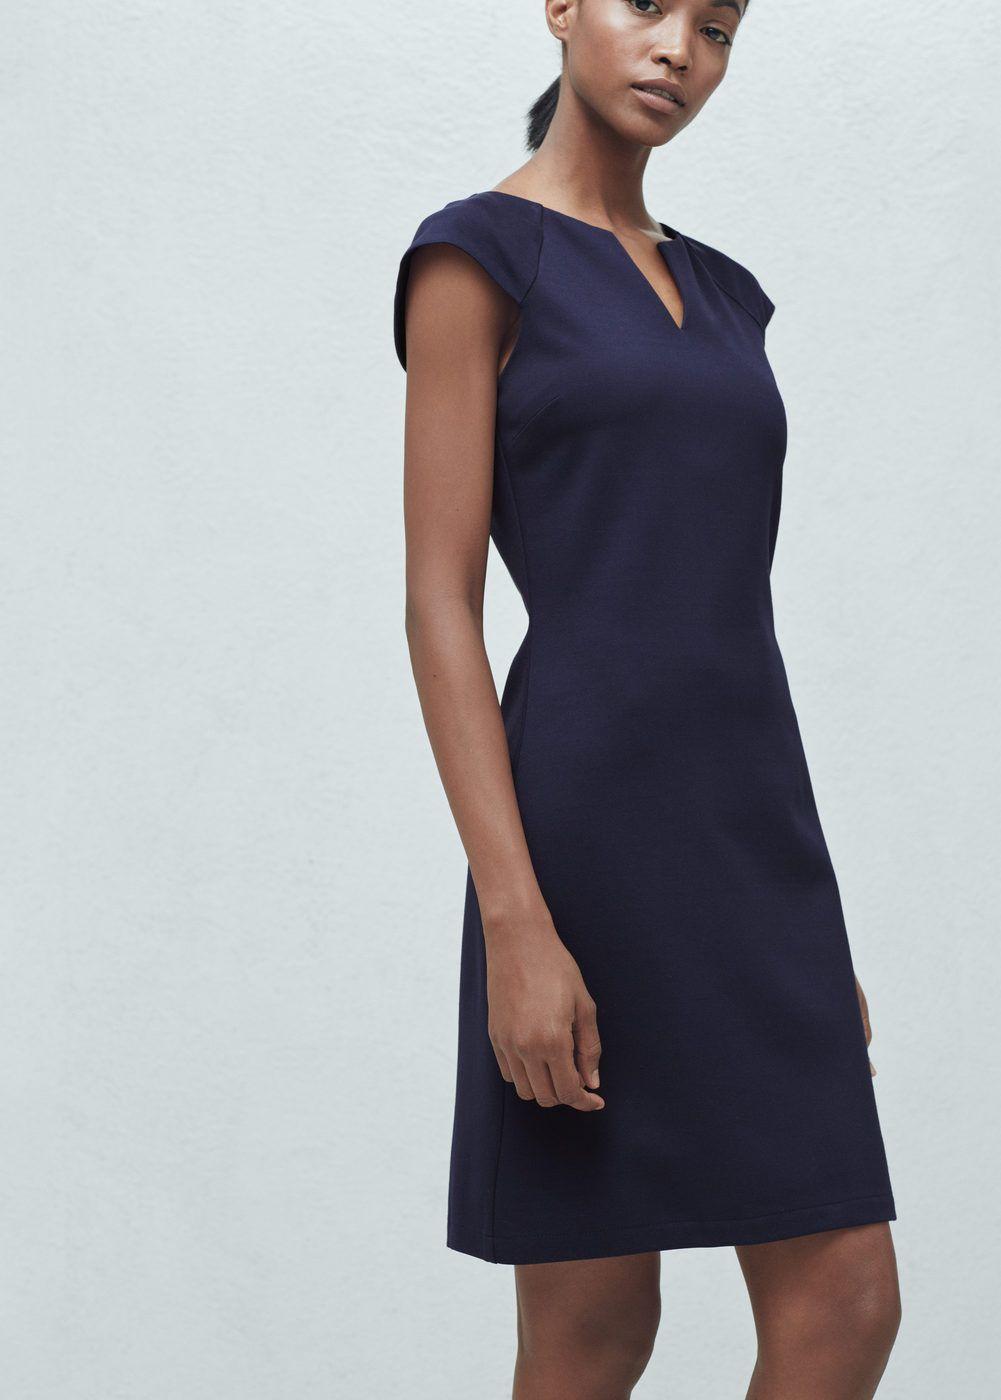 Shift dress - Women   Suits   Dresses, Womens fashion, Fashion bd0b60a361